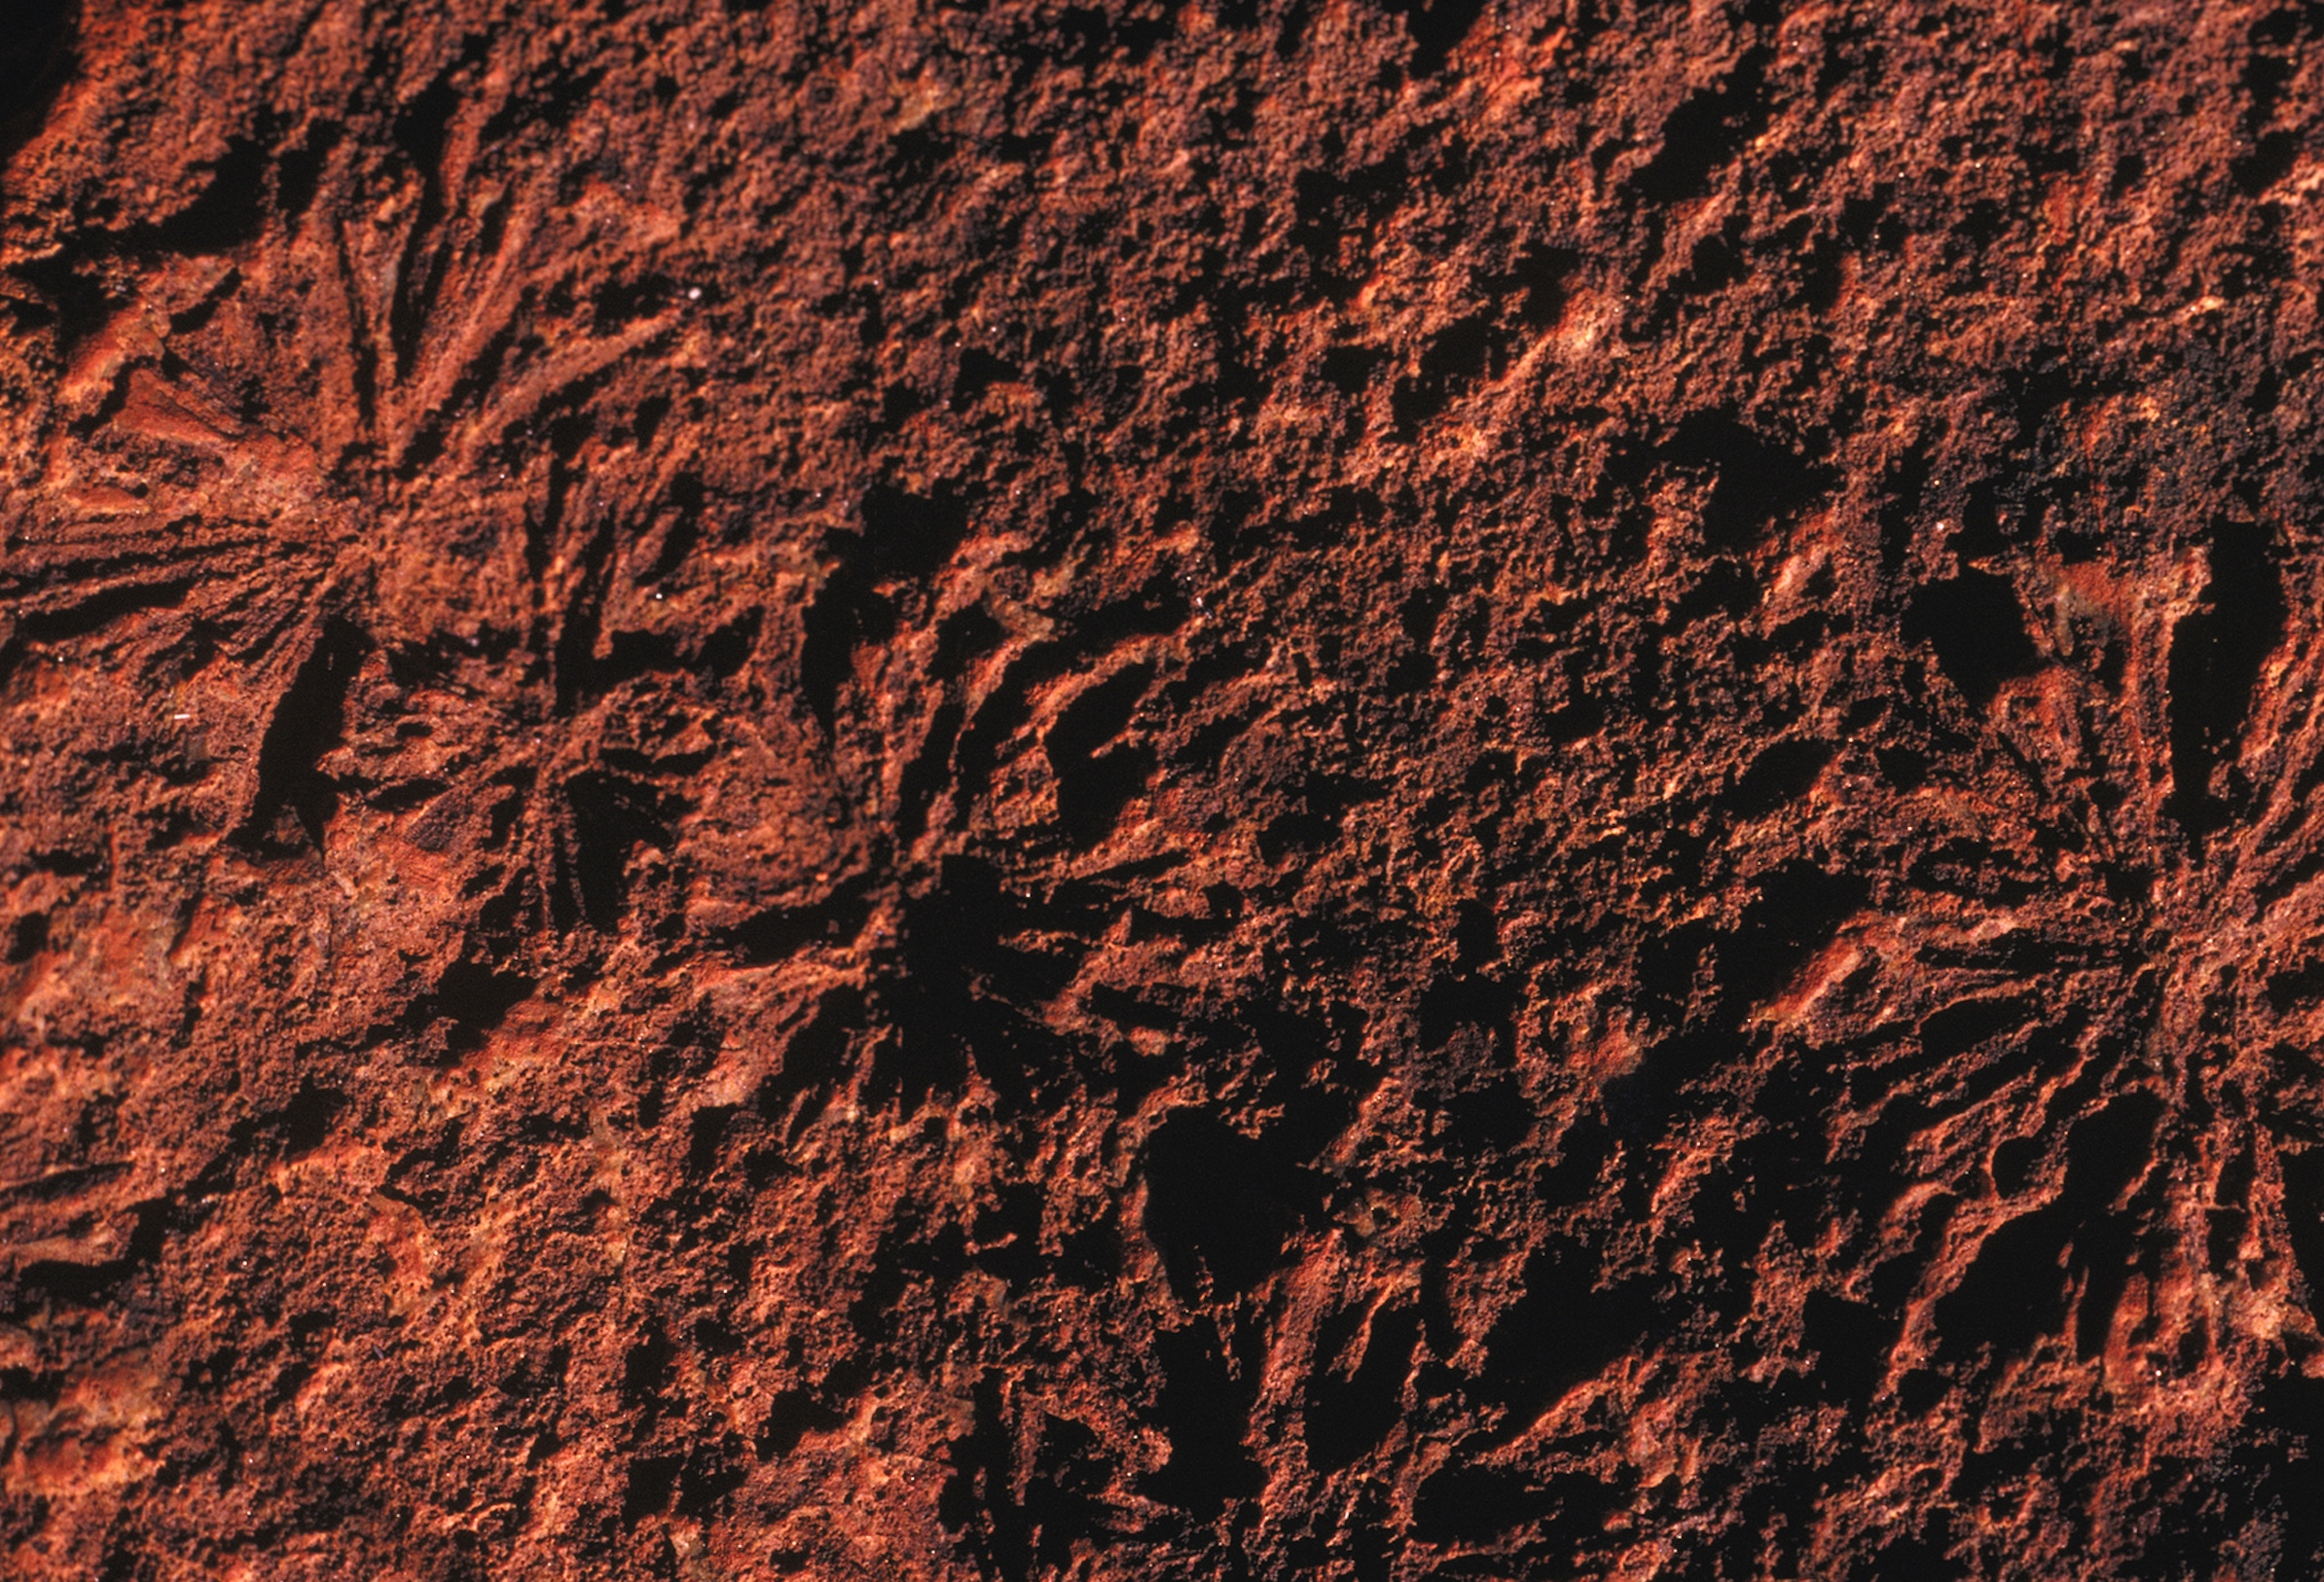 Pilbara Craton salt crystals